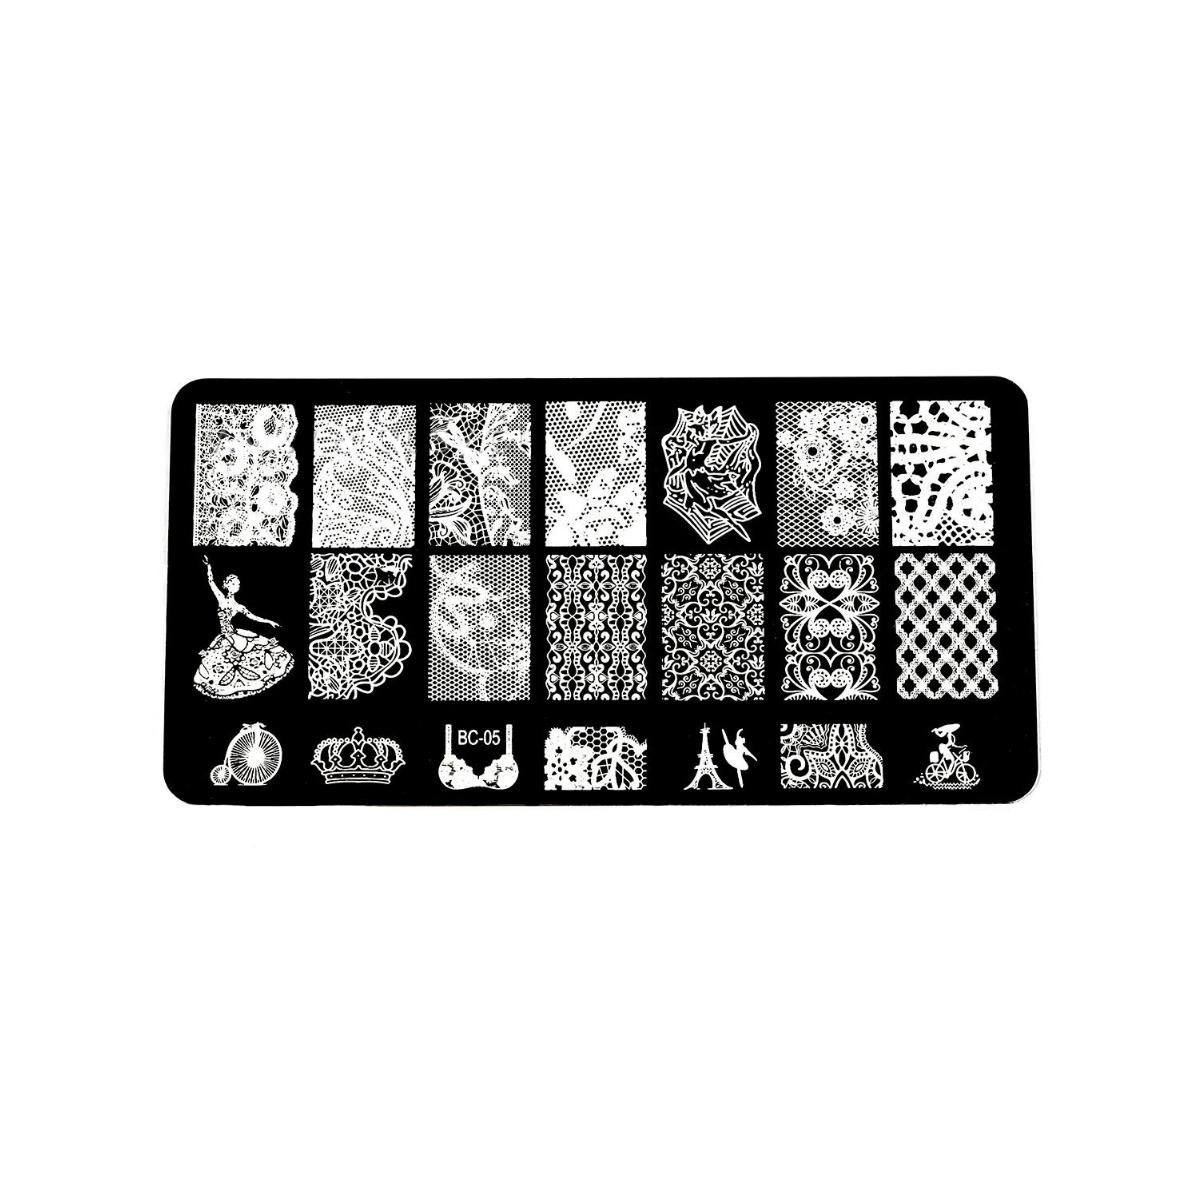 https://www.kit-manucure.com/1597-thickbox_default/plaque-de-stamping-dentelle-motif-baroque-et-femme-bc05.jpg